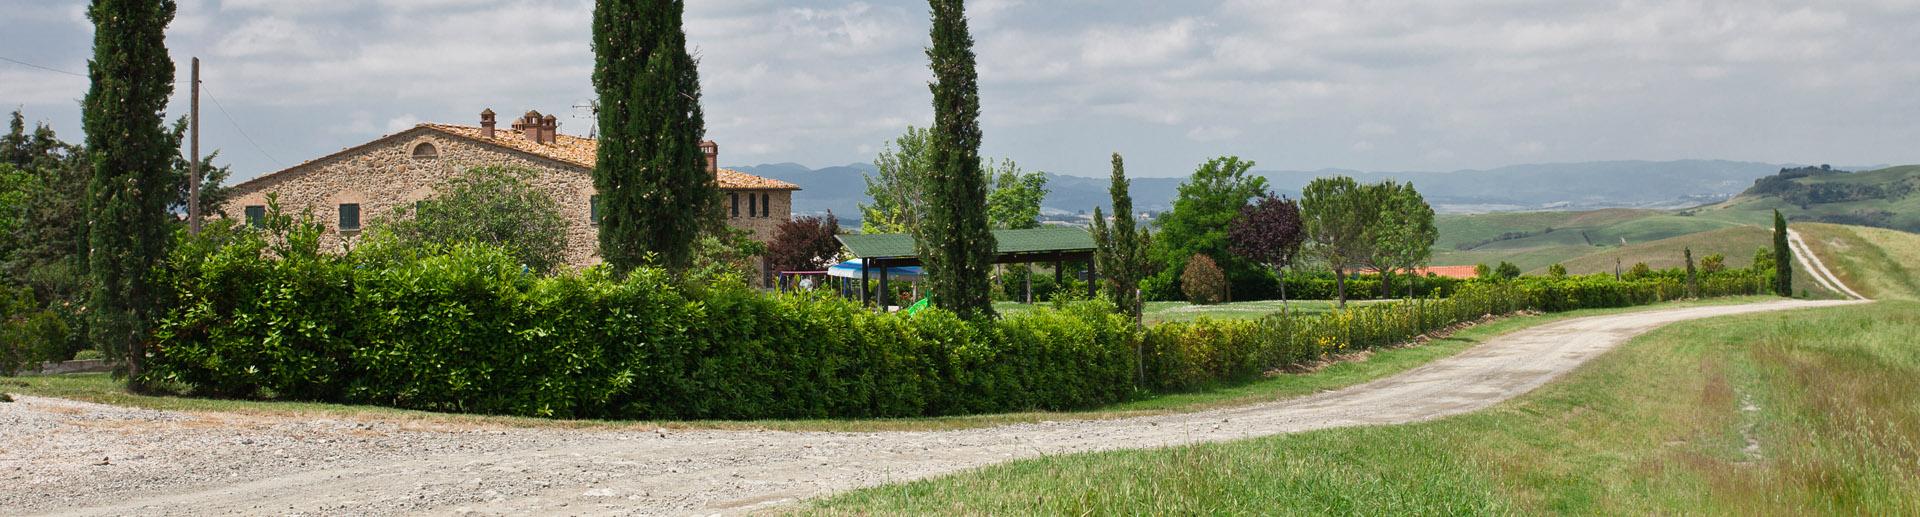 toscane gite ruraux ferme